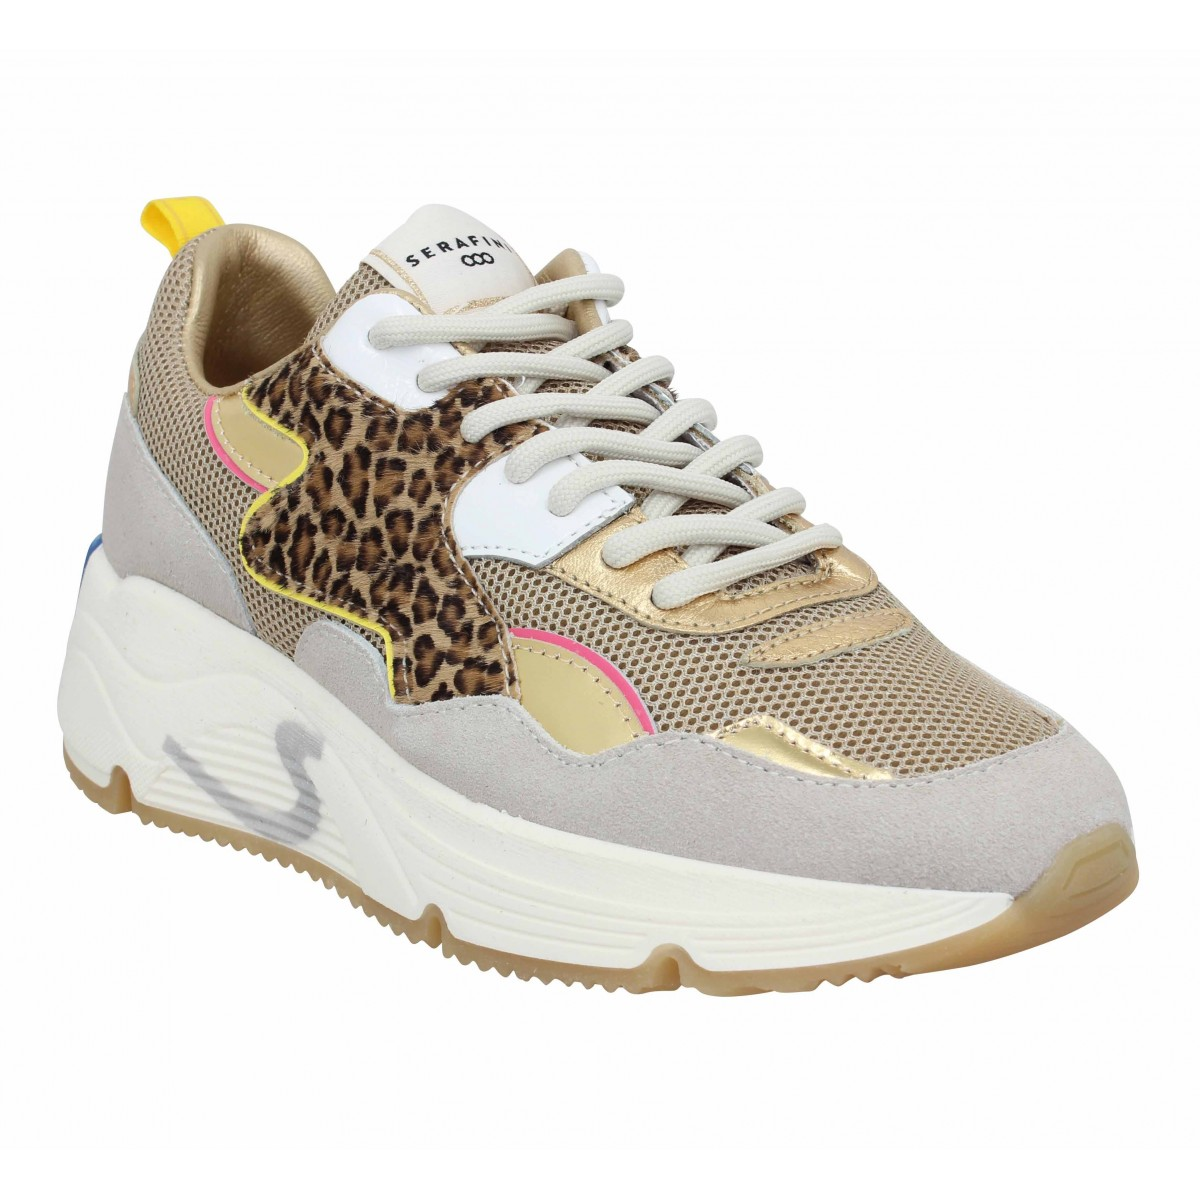 Baskets SERAFINI Malibu velours toile Femme Gold Leopard